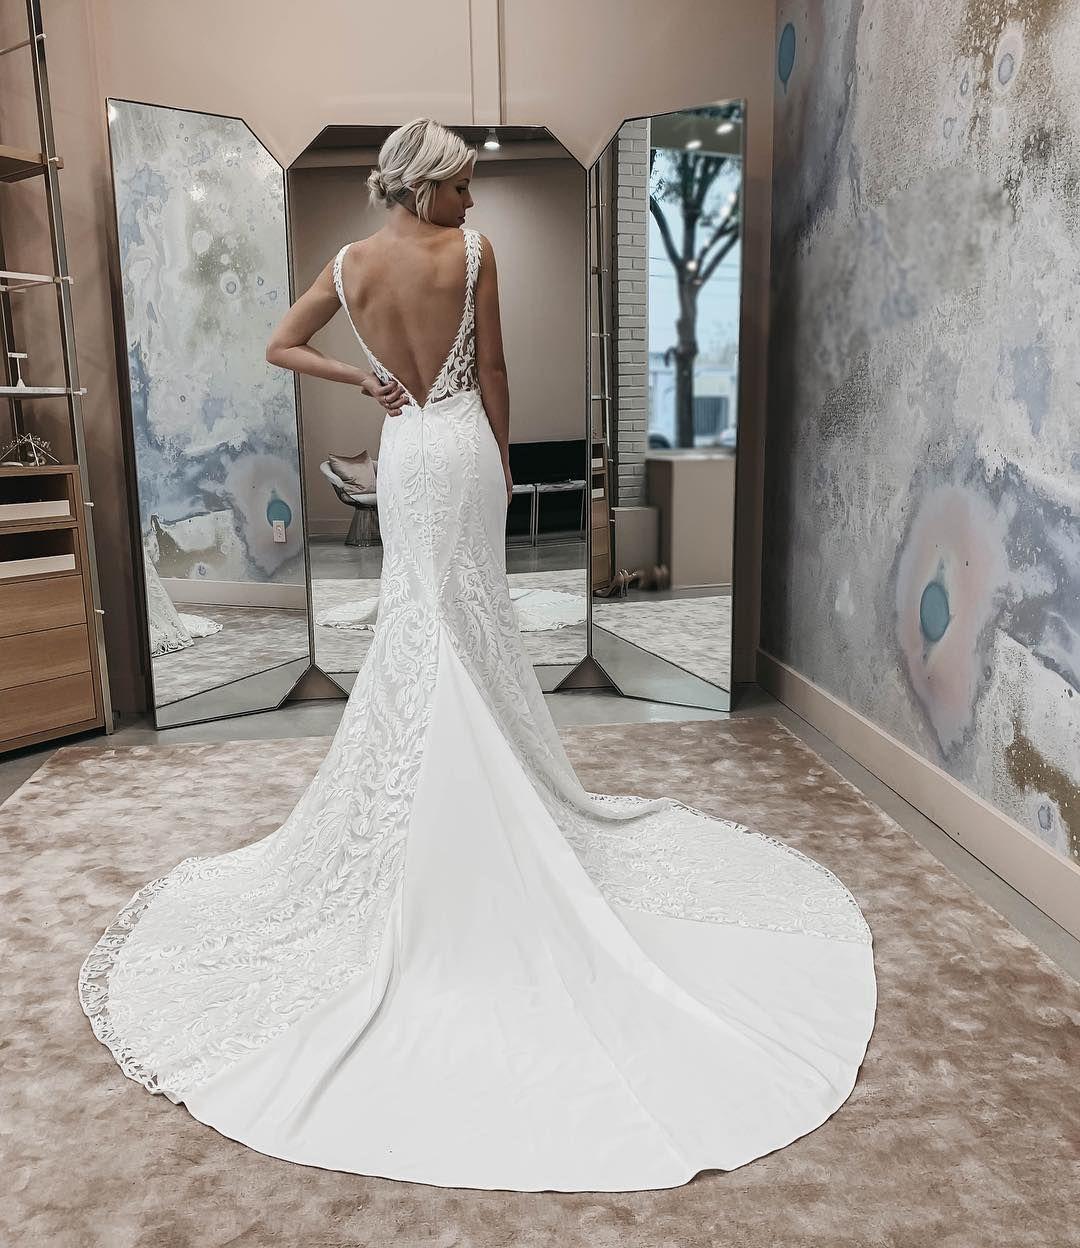 Pin On Wedding Dress Goals For The Alternative Boho Bride [ 1248 x 1080 Pixel ]